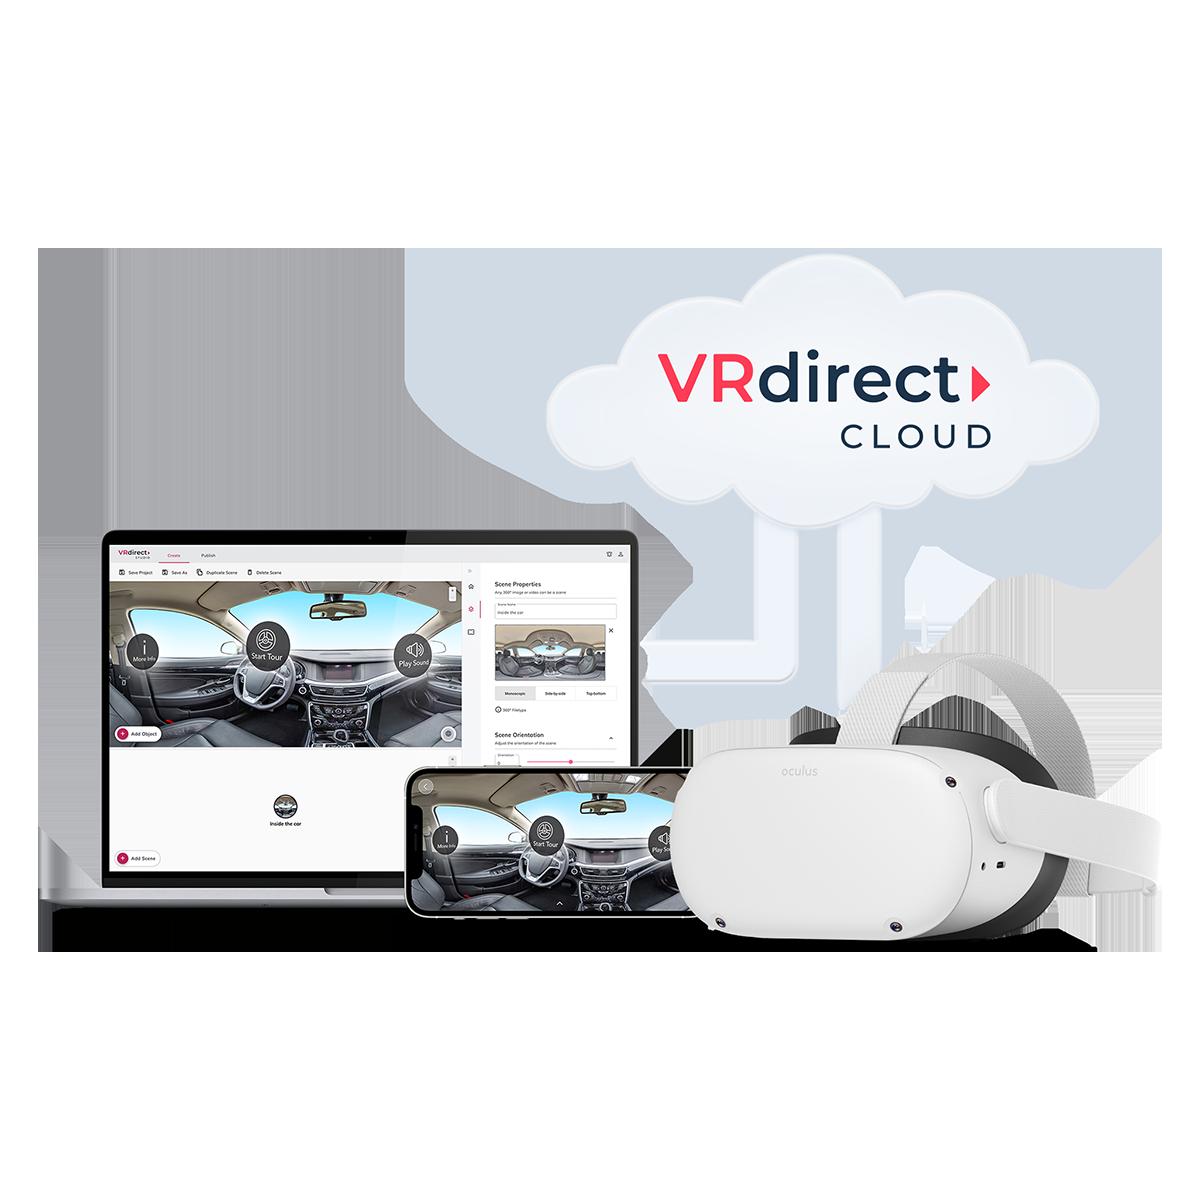 VRdirect Cloud – Features